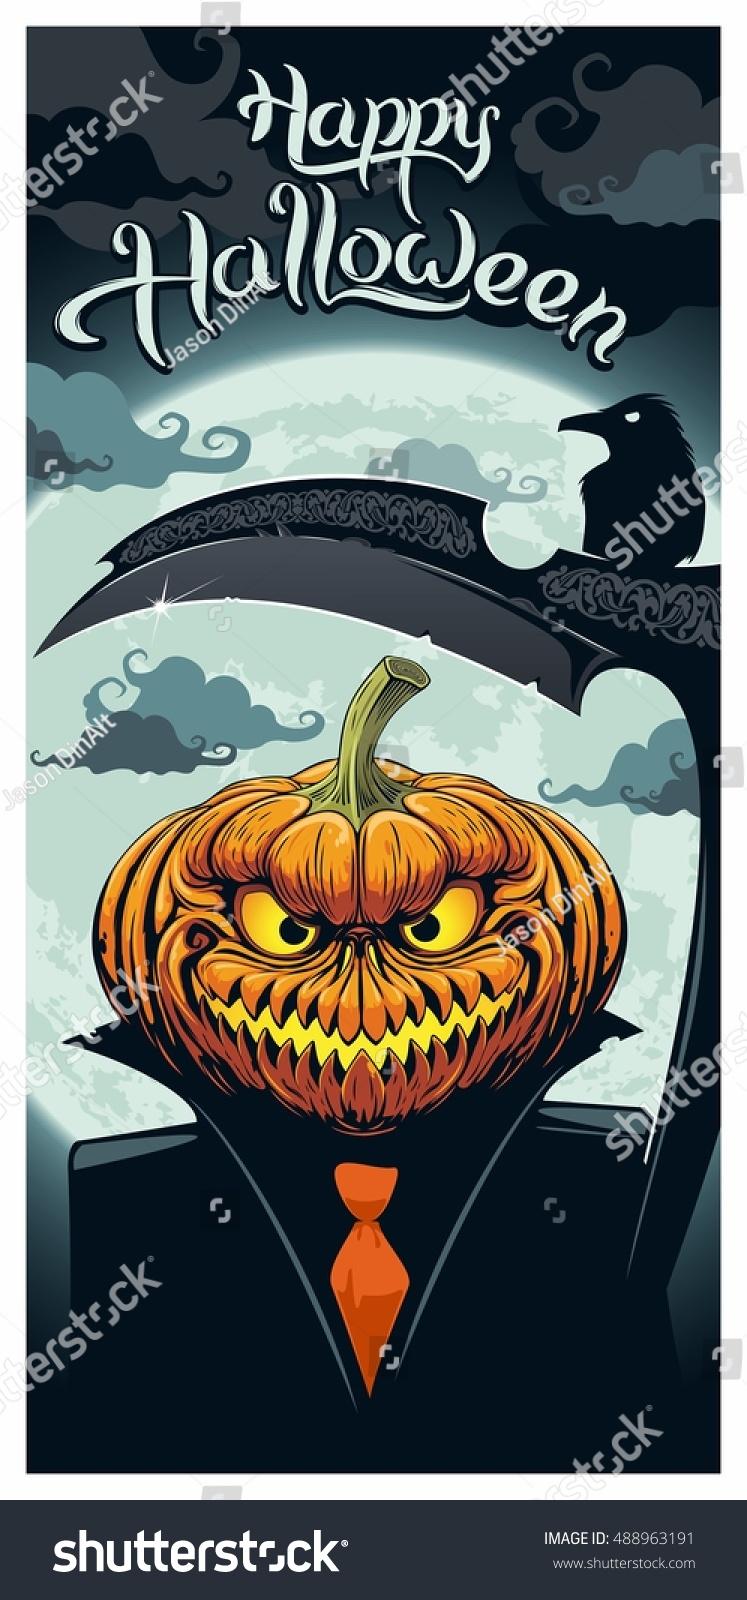 Pumpkin Reaper In Black Suit With Scythe